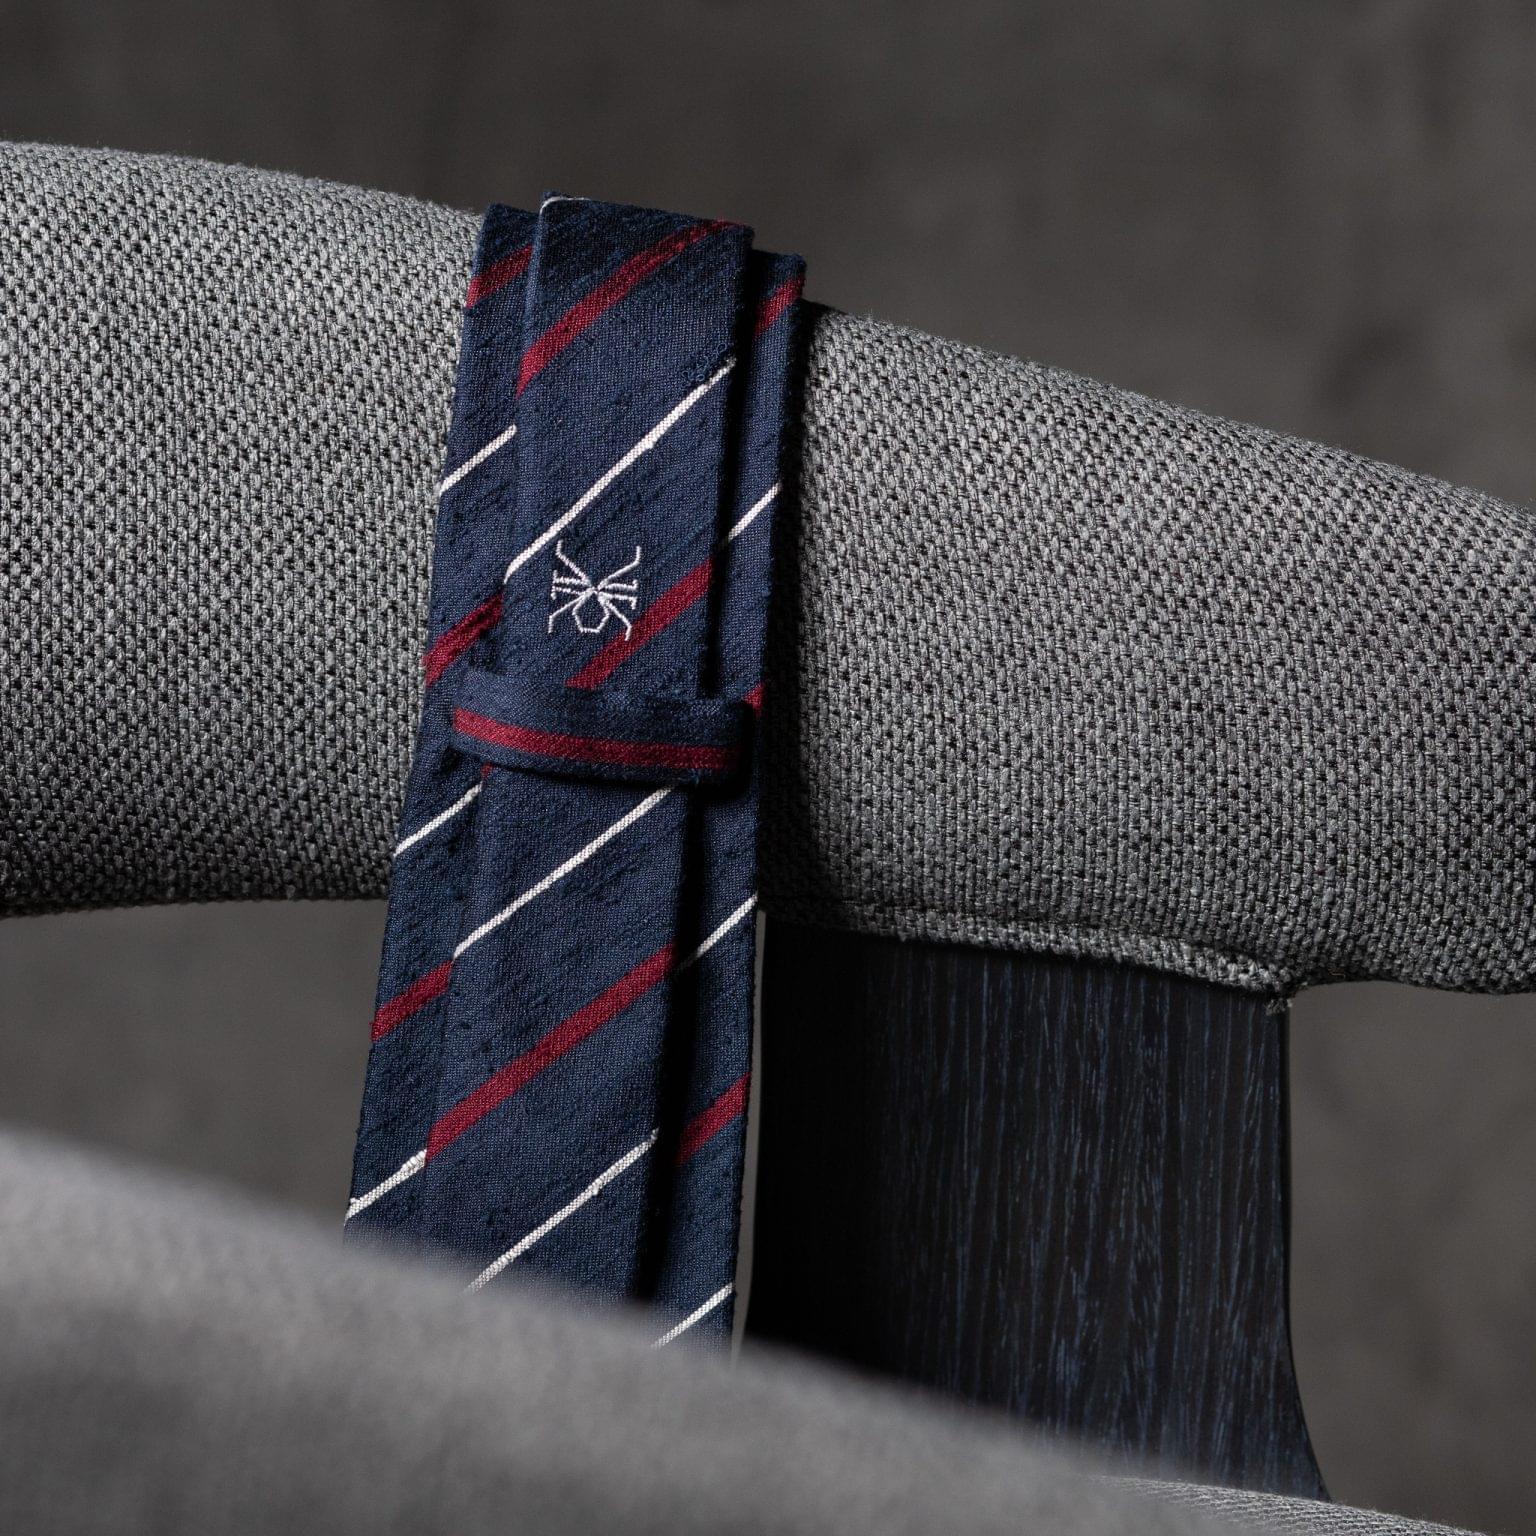 SHANTUNG-0525-Tie-Initials-Corbata-Iniciales-The-Seelk-4